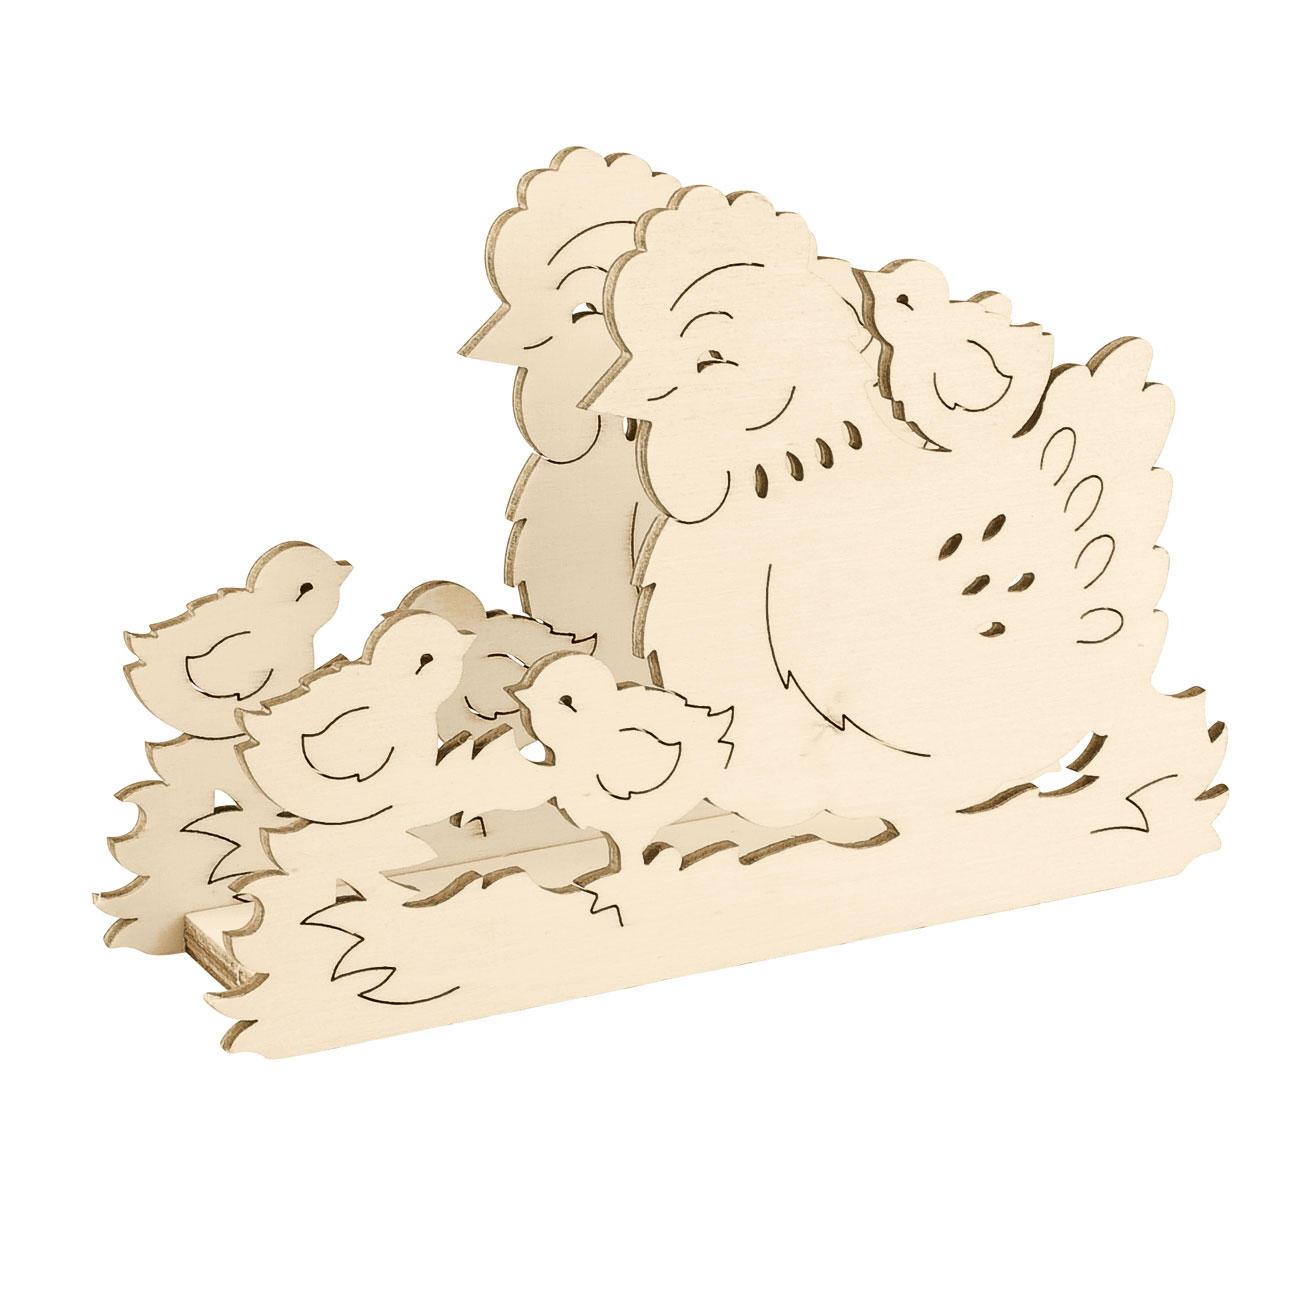 serviettenhalter aus holz fr hling ostern saisonales basteln basteln basteln f r den. Black Bedroom Furniture Sets. Home Design Ideas